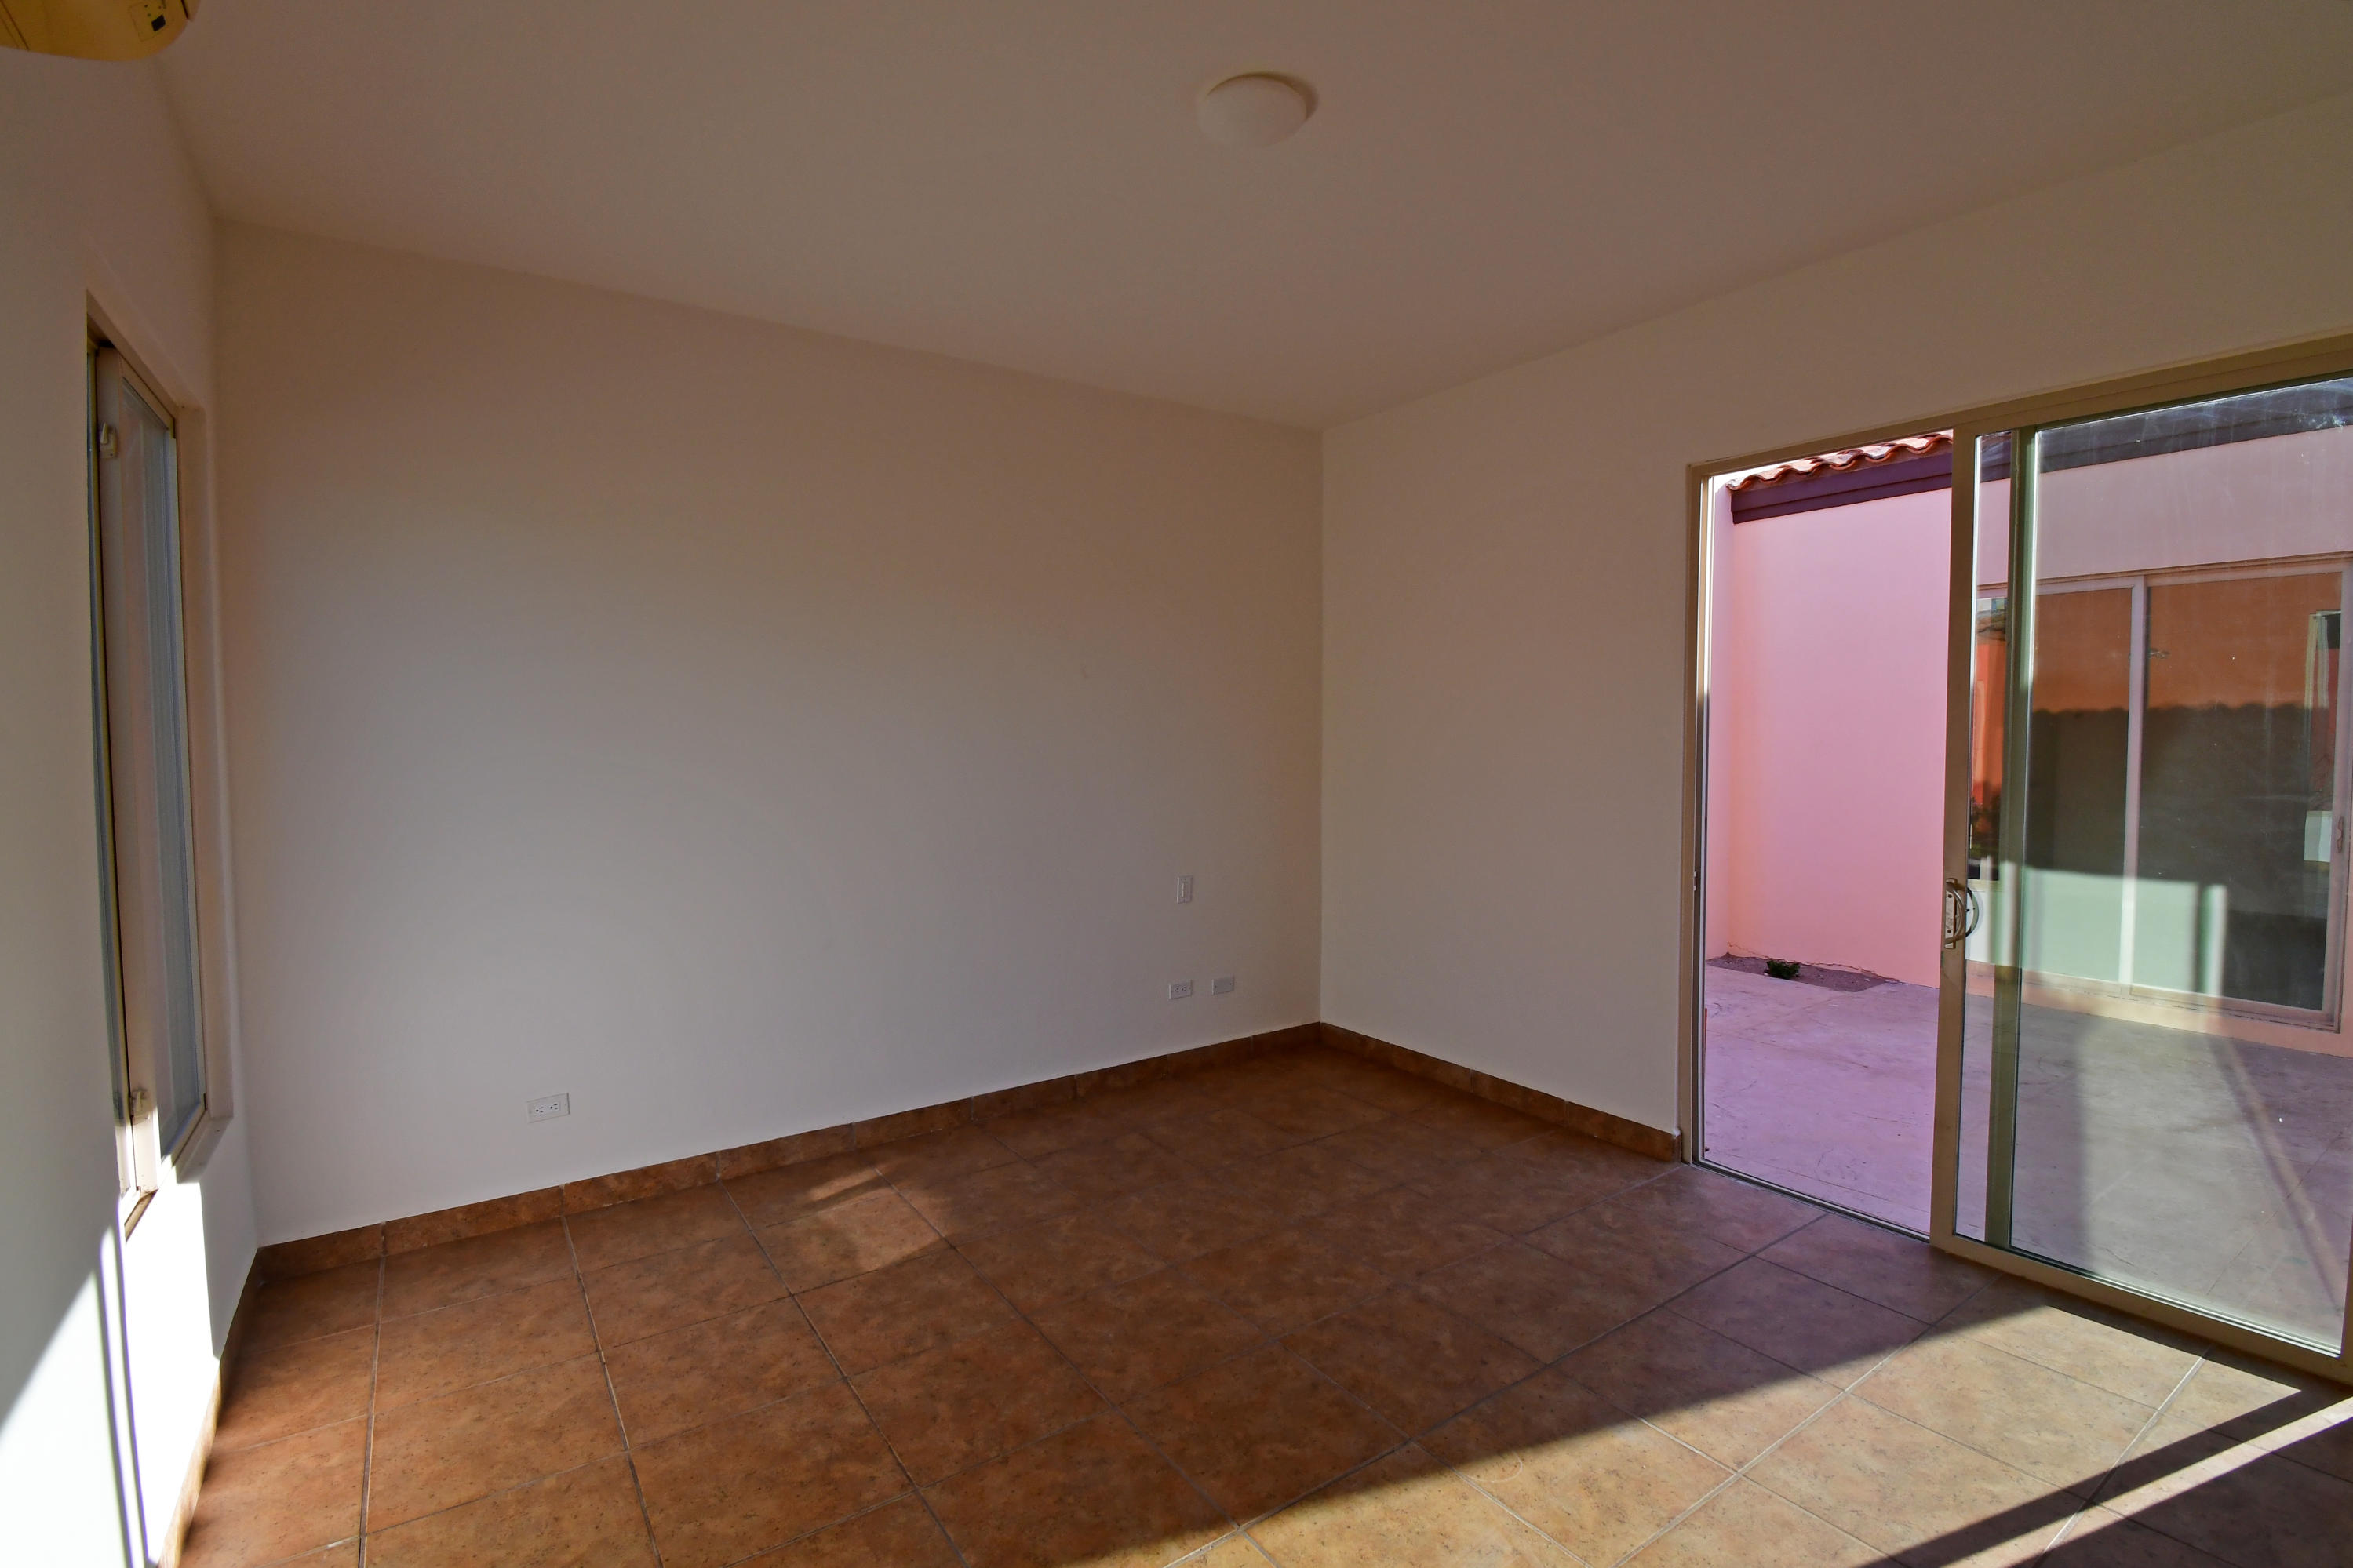 La Paz, 3 Bedrooms Bedrooms, ,3 BathroomsBathrooms,House,For Sale,Bugambiia,19-891